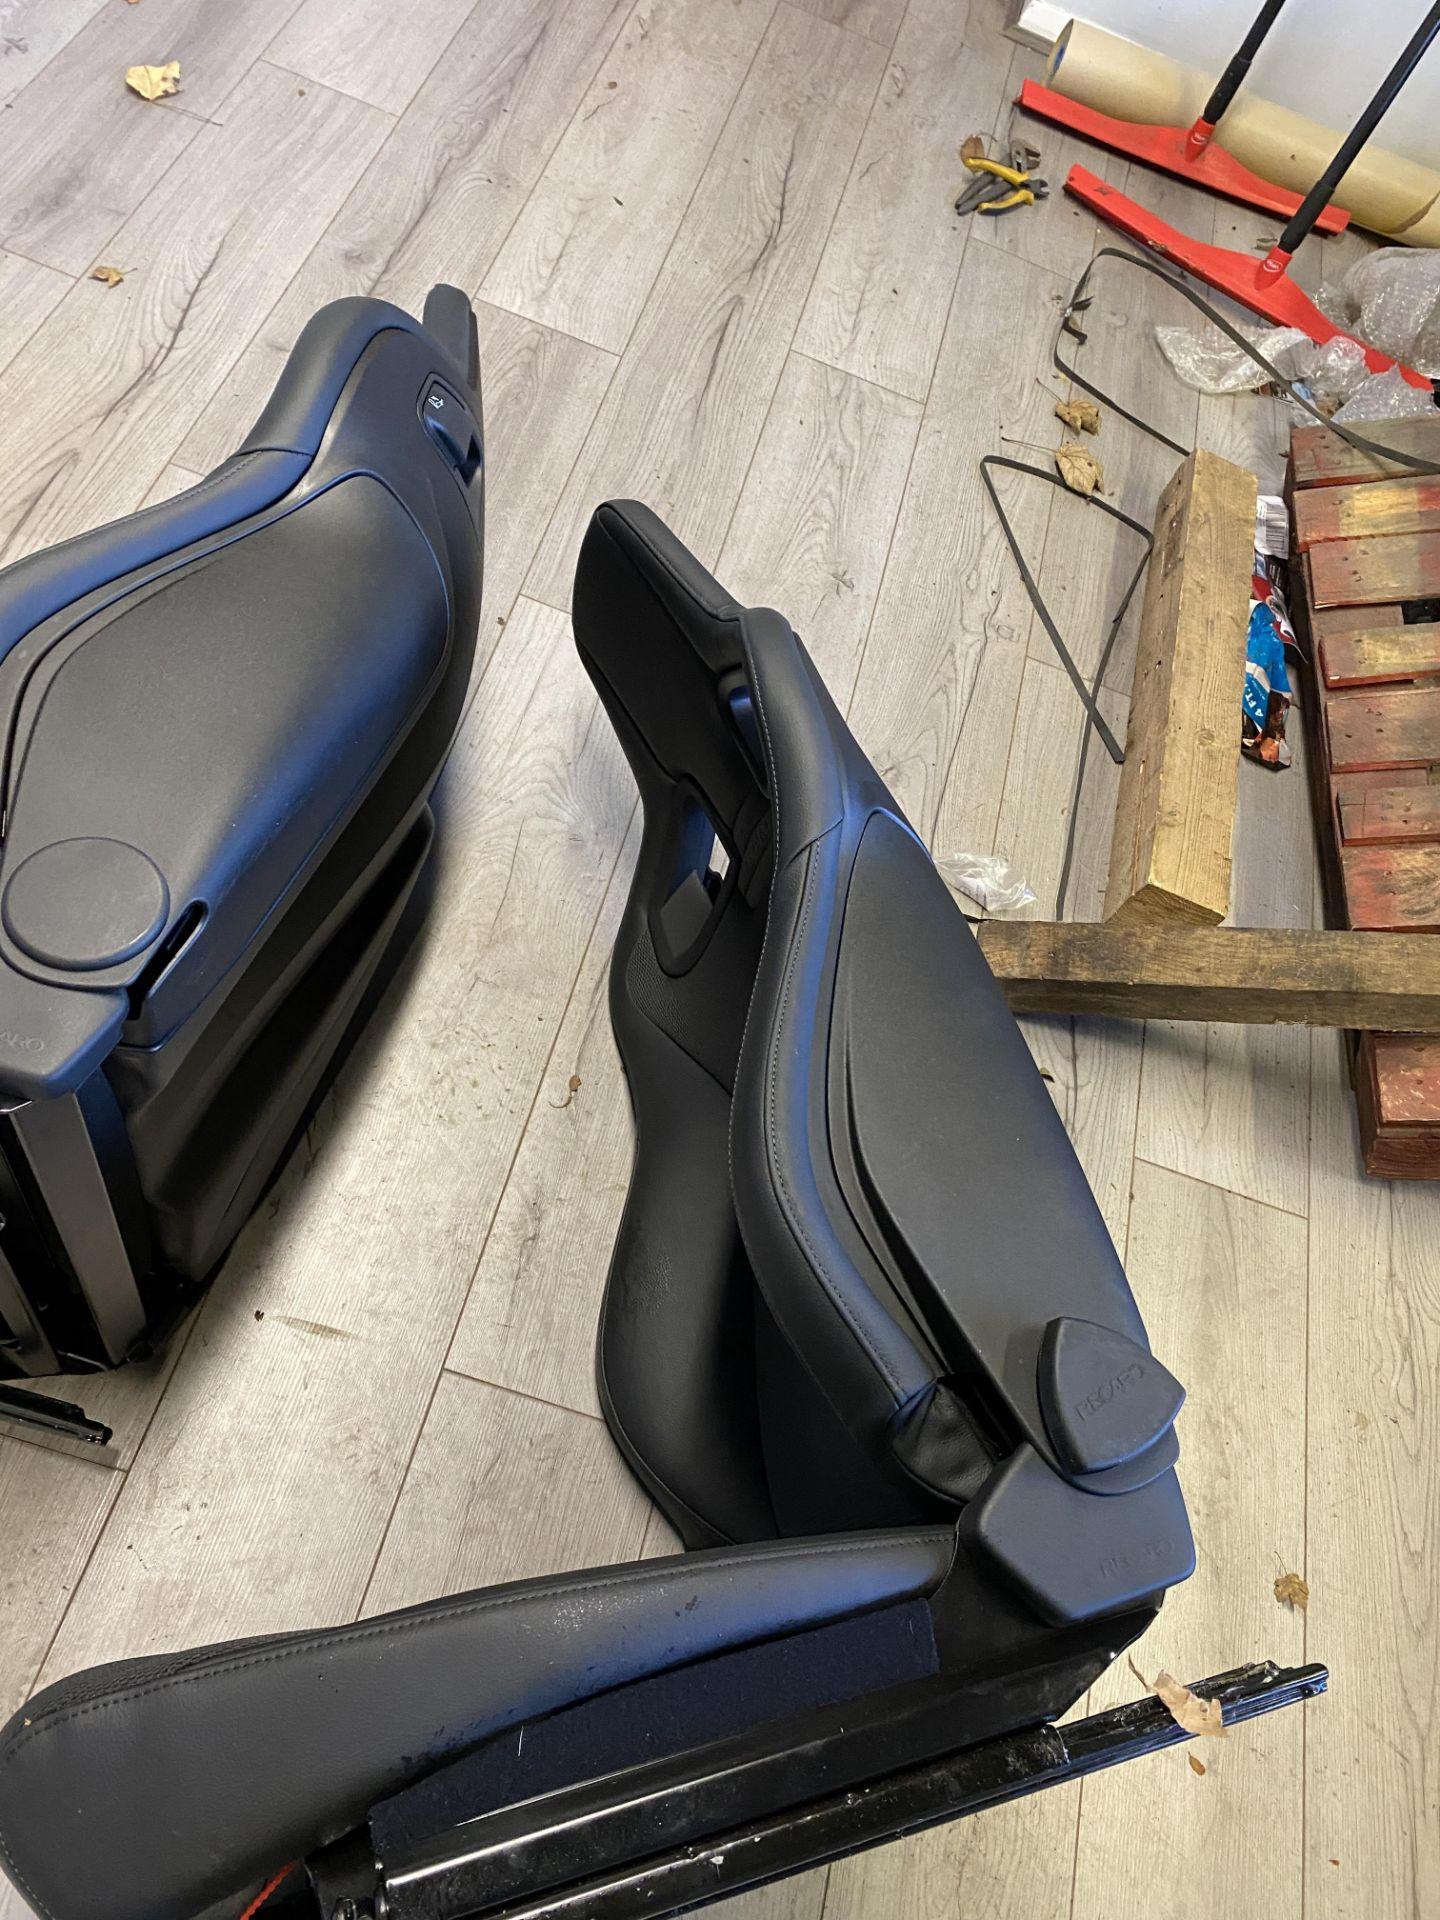 Pair of LH & RH Genuine Recaro Defender Heated Seats - Image 35 of 35